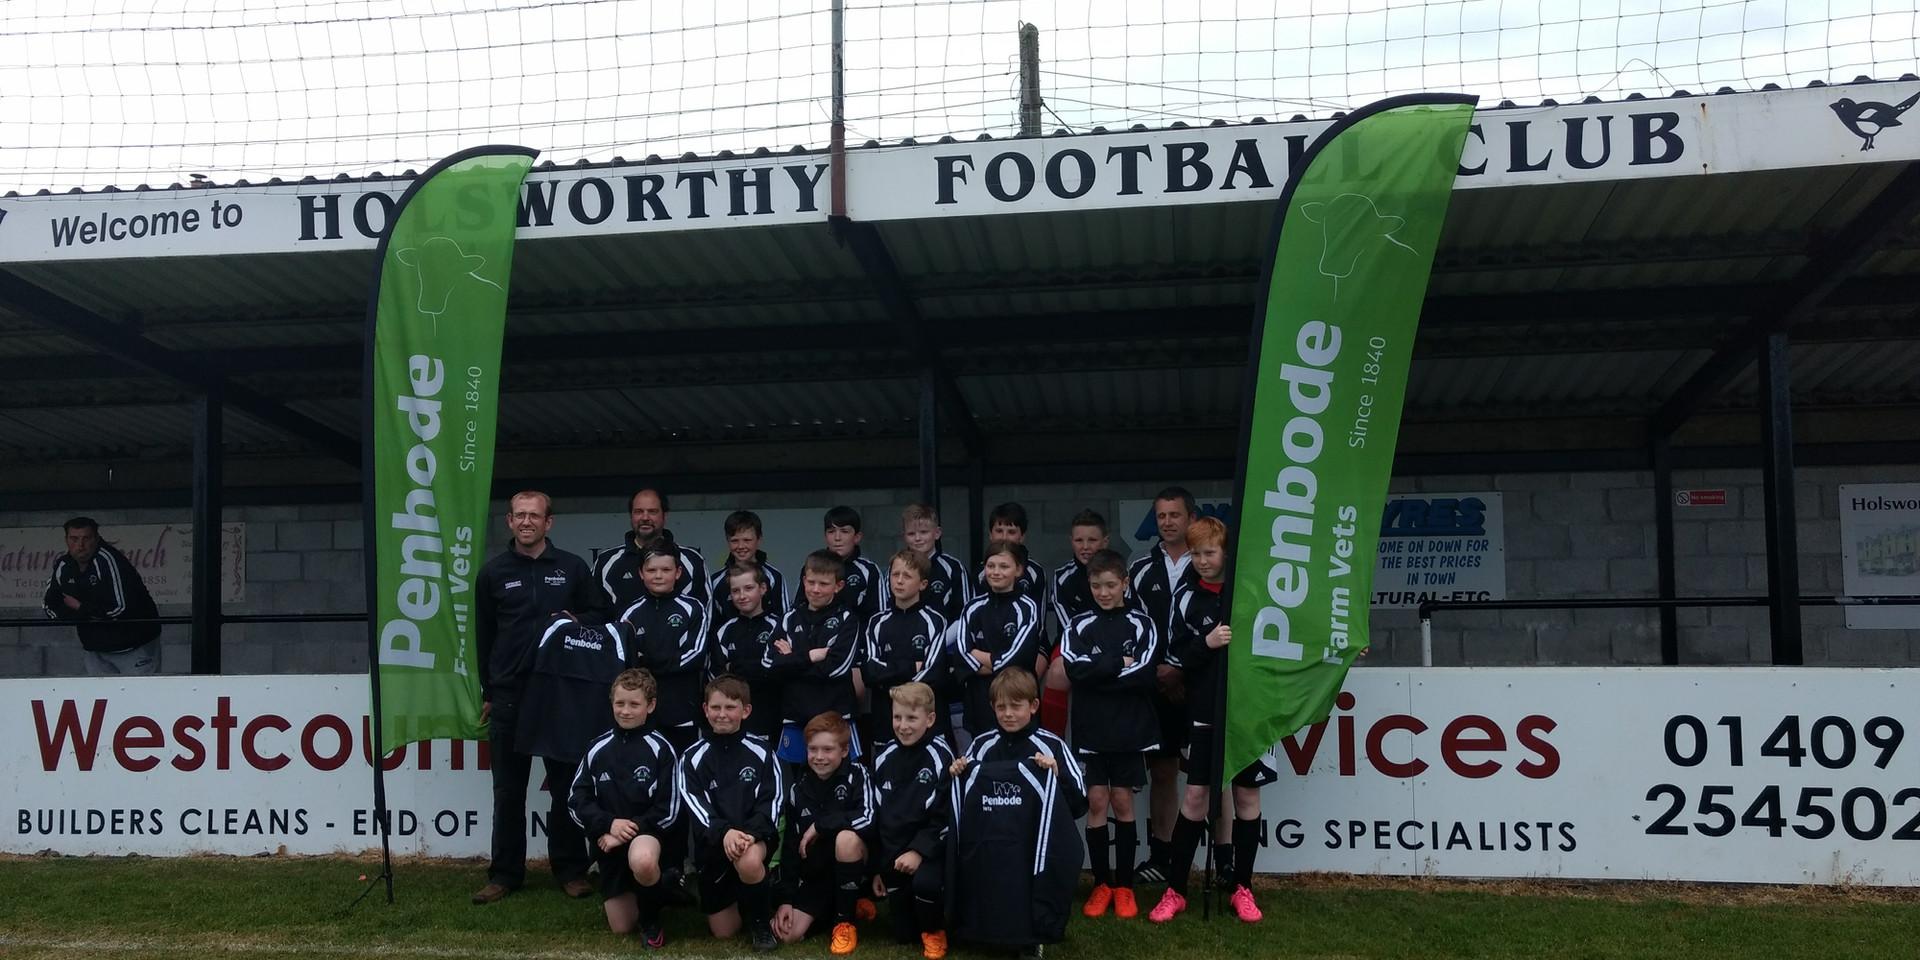 Penbode Vets sponsor the Holsworthy FC colts strip